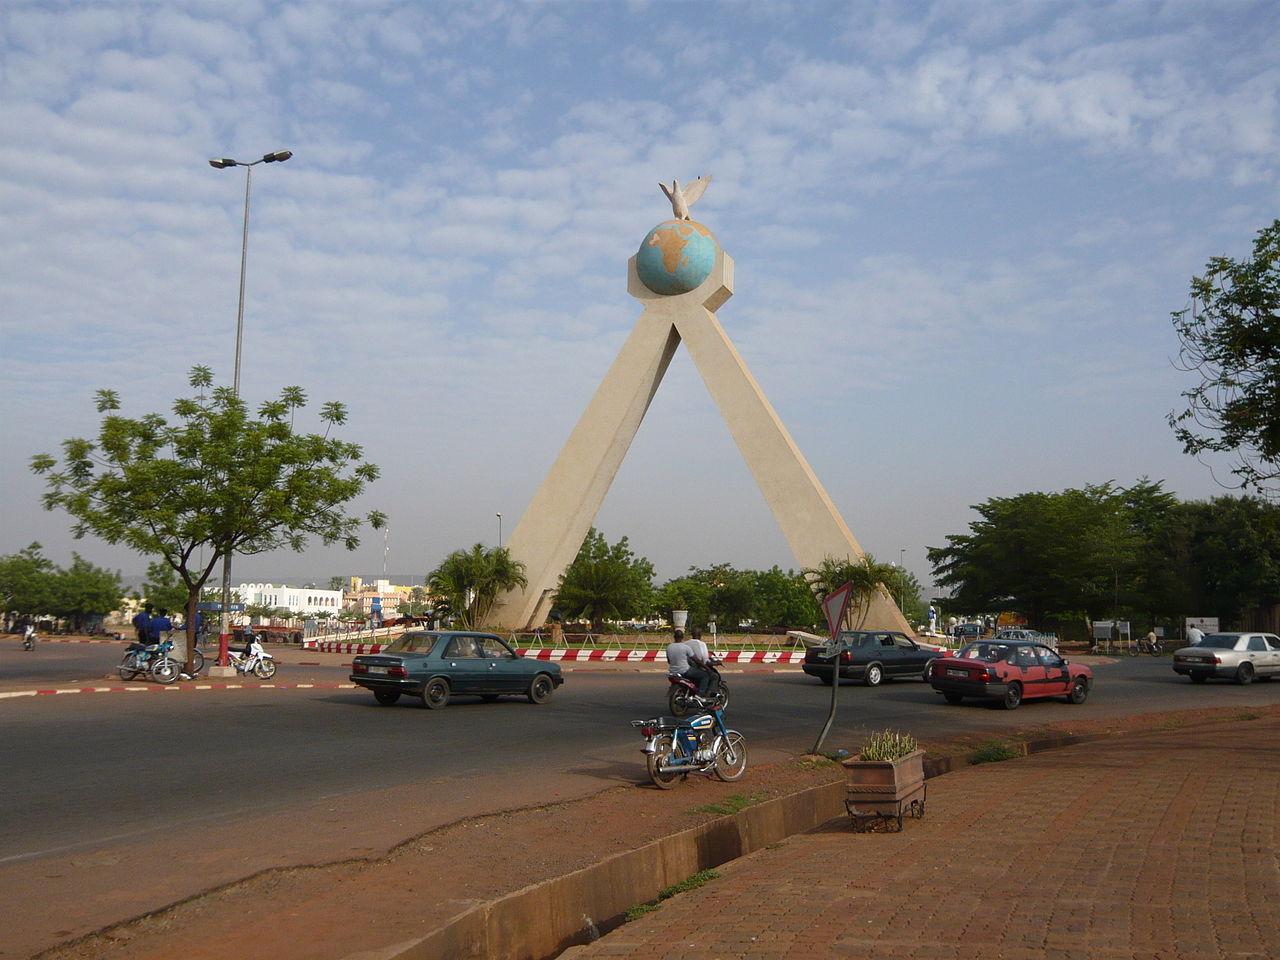 Anschlag auf das Radisson Blu Hotel in Bamako, Mali 1280px-Monument_de_la_paix_-_Bamako